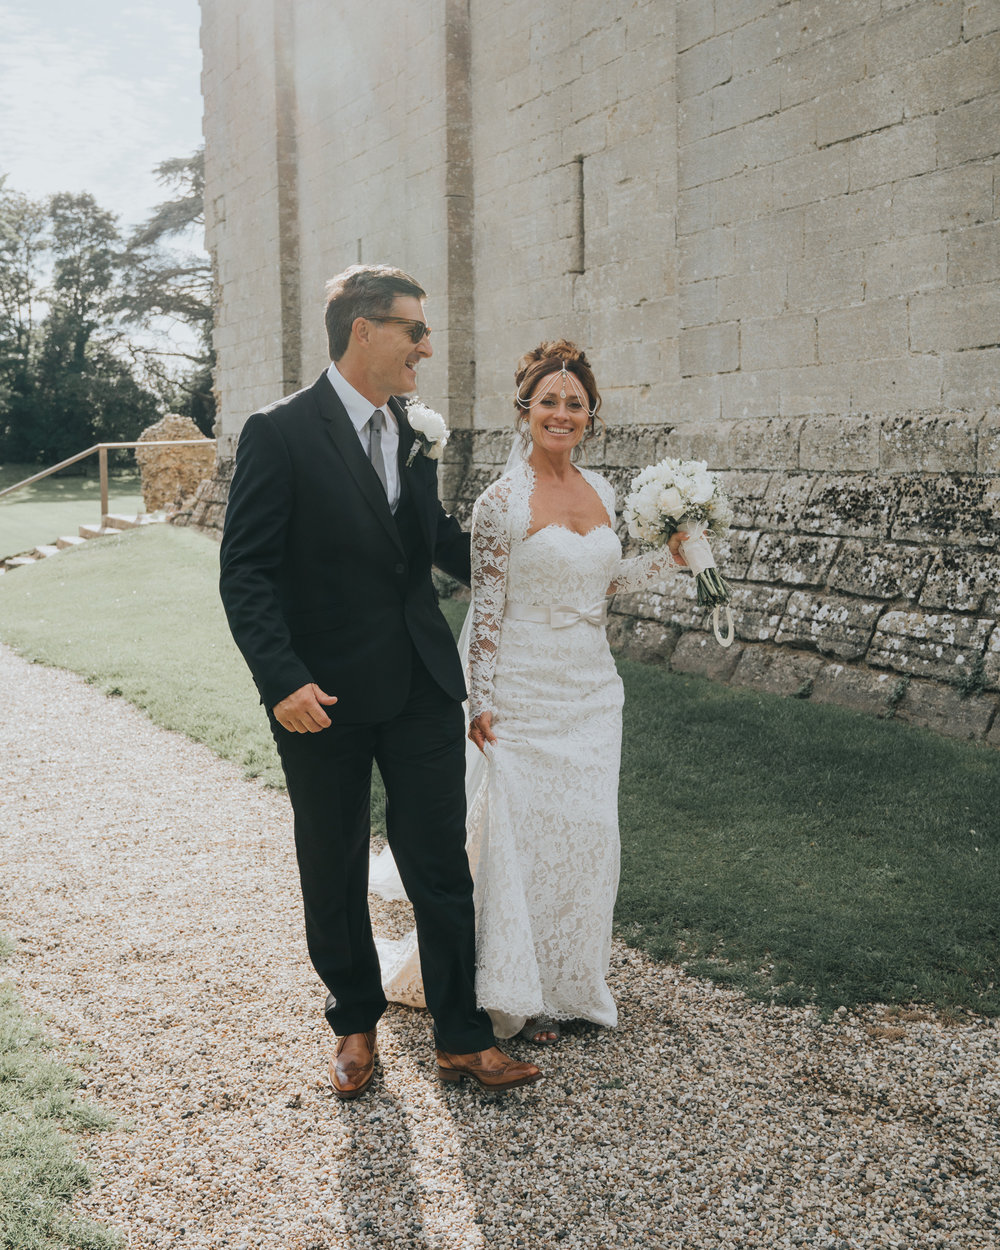 grace-elizabeth-boho-wedding-headingham-castle-essex-wedding-photographer-63.jpg